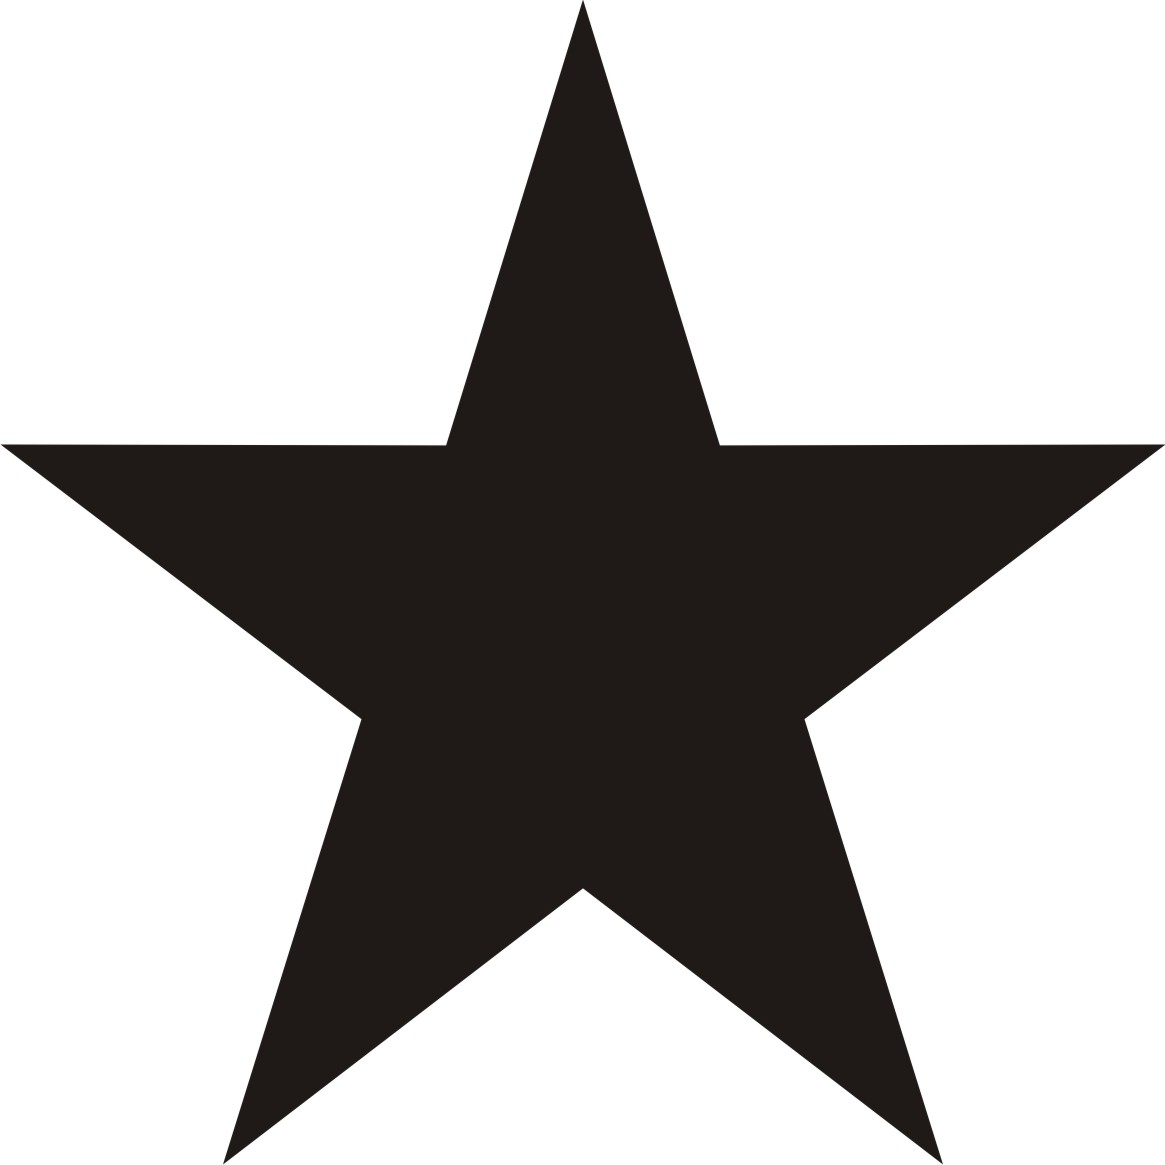 5 Point Star Clip Art Black and White